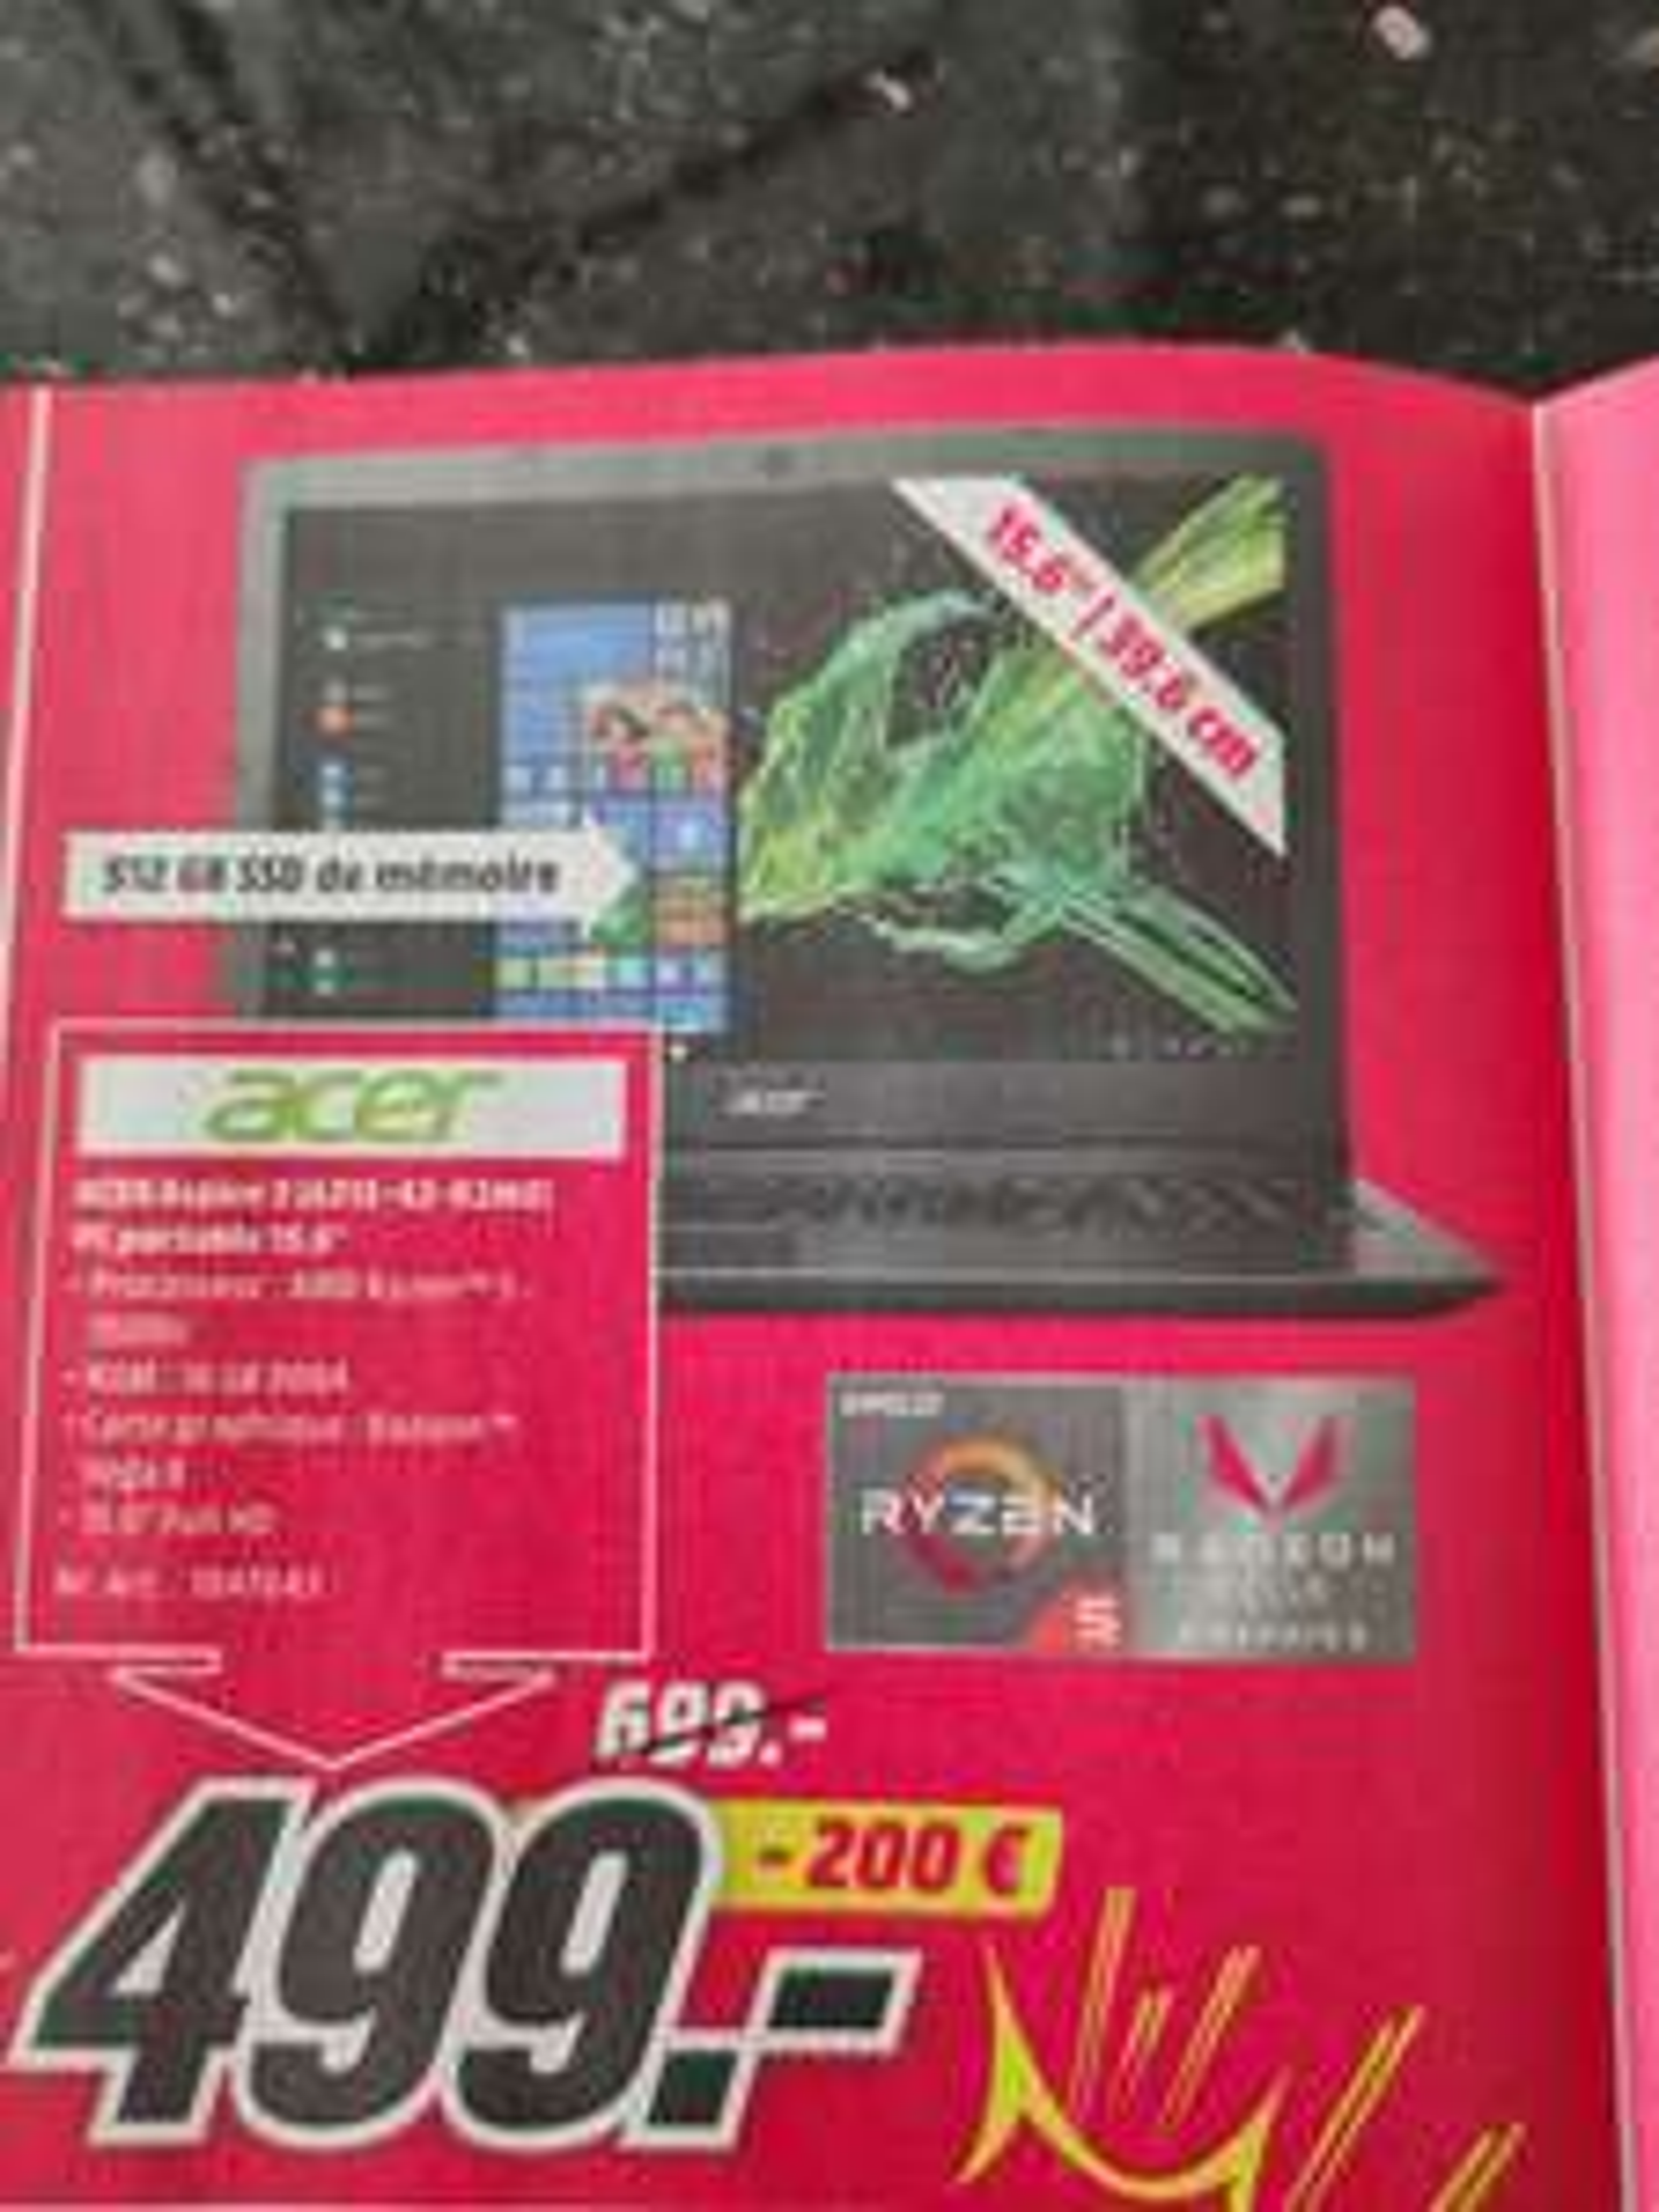 "PC Portable 15.6"" Acer Aspire 3 A315-42-R2M0 - Ryzen 5 3500U, 16 Go de RAM, SSD 512 Go, Vega 8 (Frontaliers Belgique)"